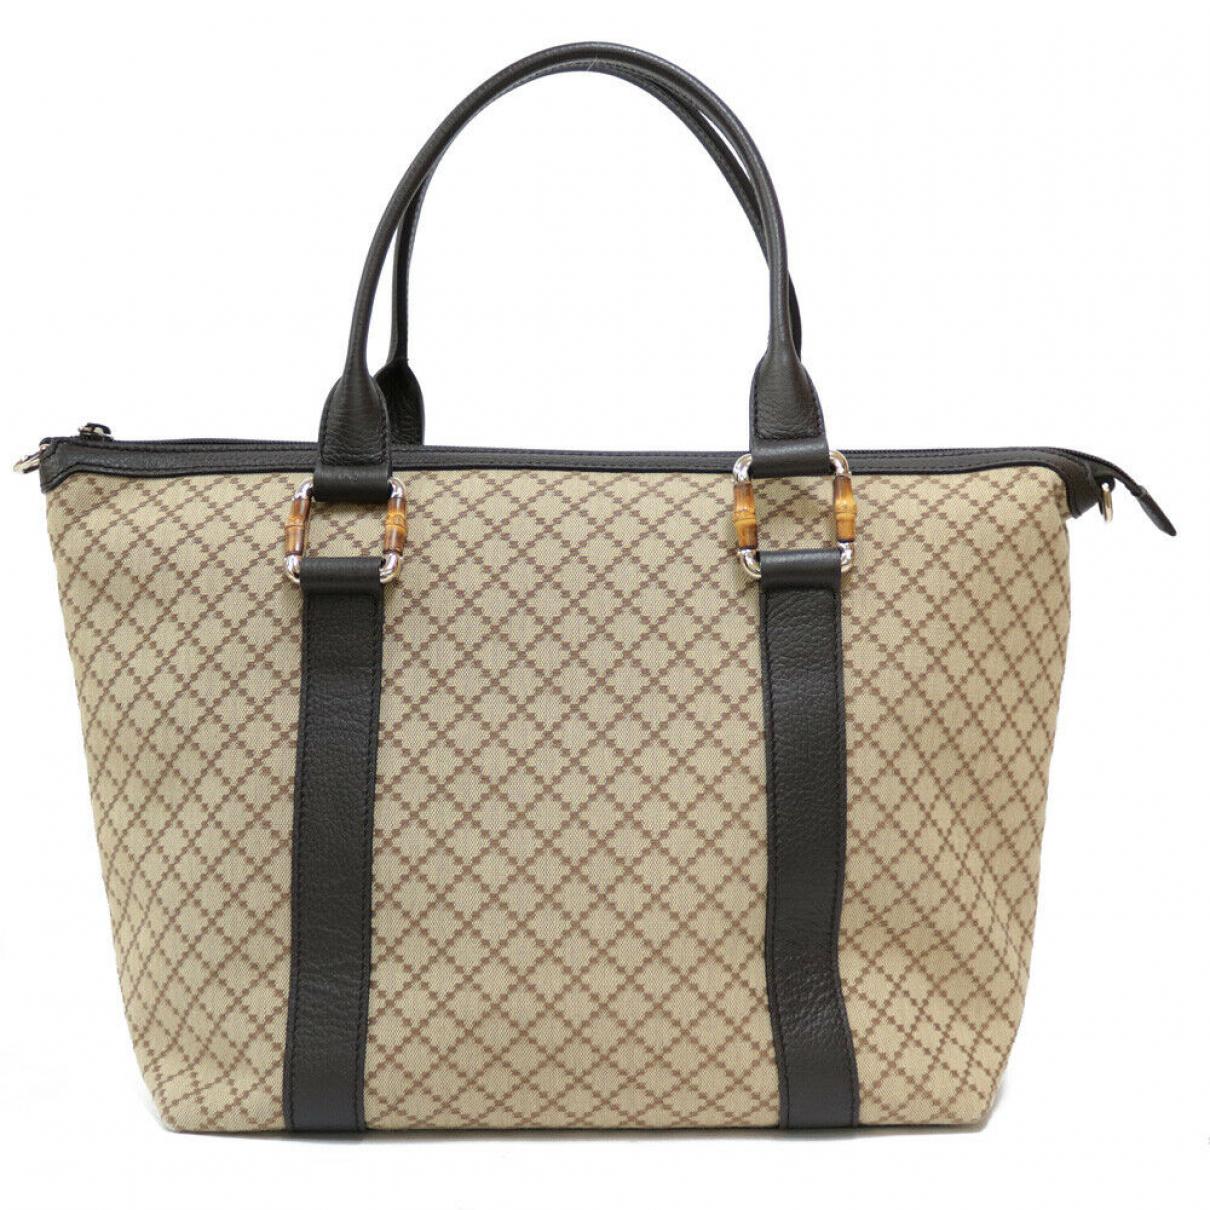 Gucci - Sac a main   pour femme en cuir